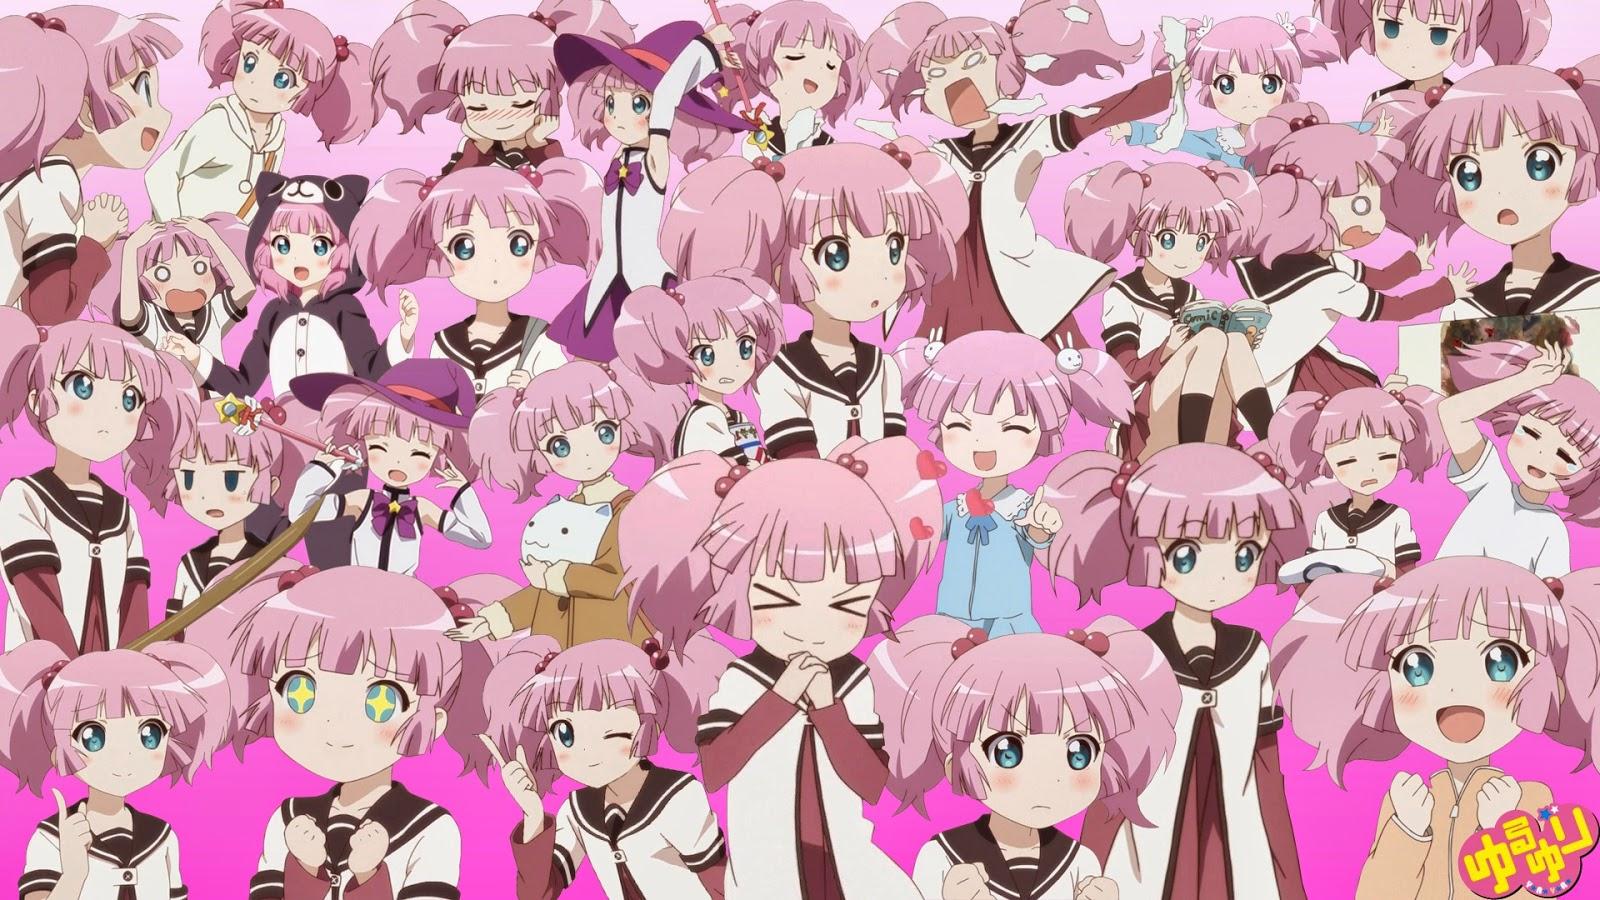 Hanako Ohmuro Omuro Voiced By Rina Hidaka Sakurakos Younger Sister Who Is An Elementary School Student And Eight Years Old